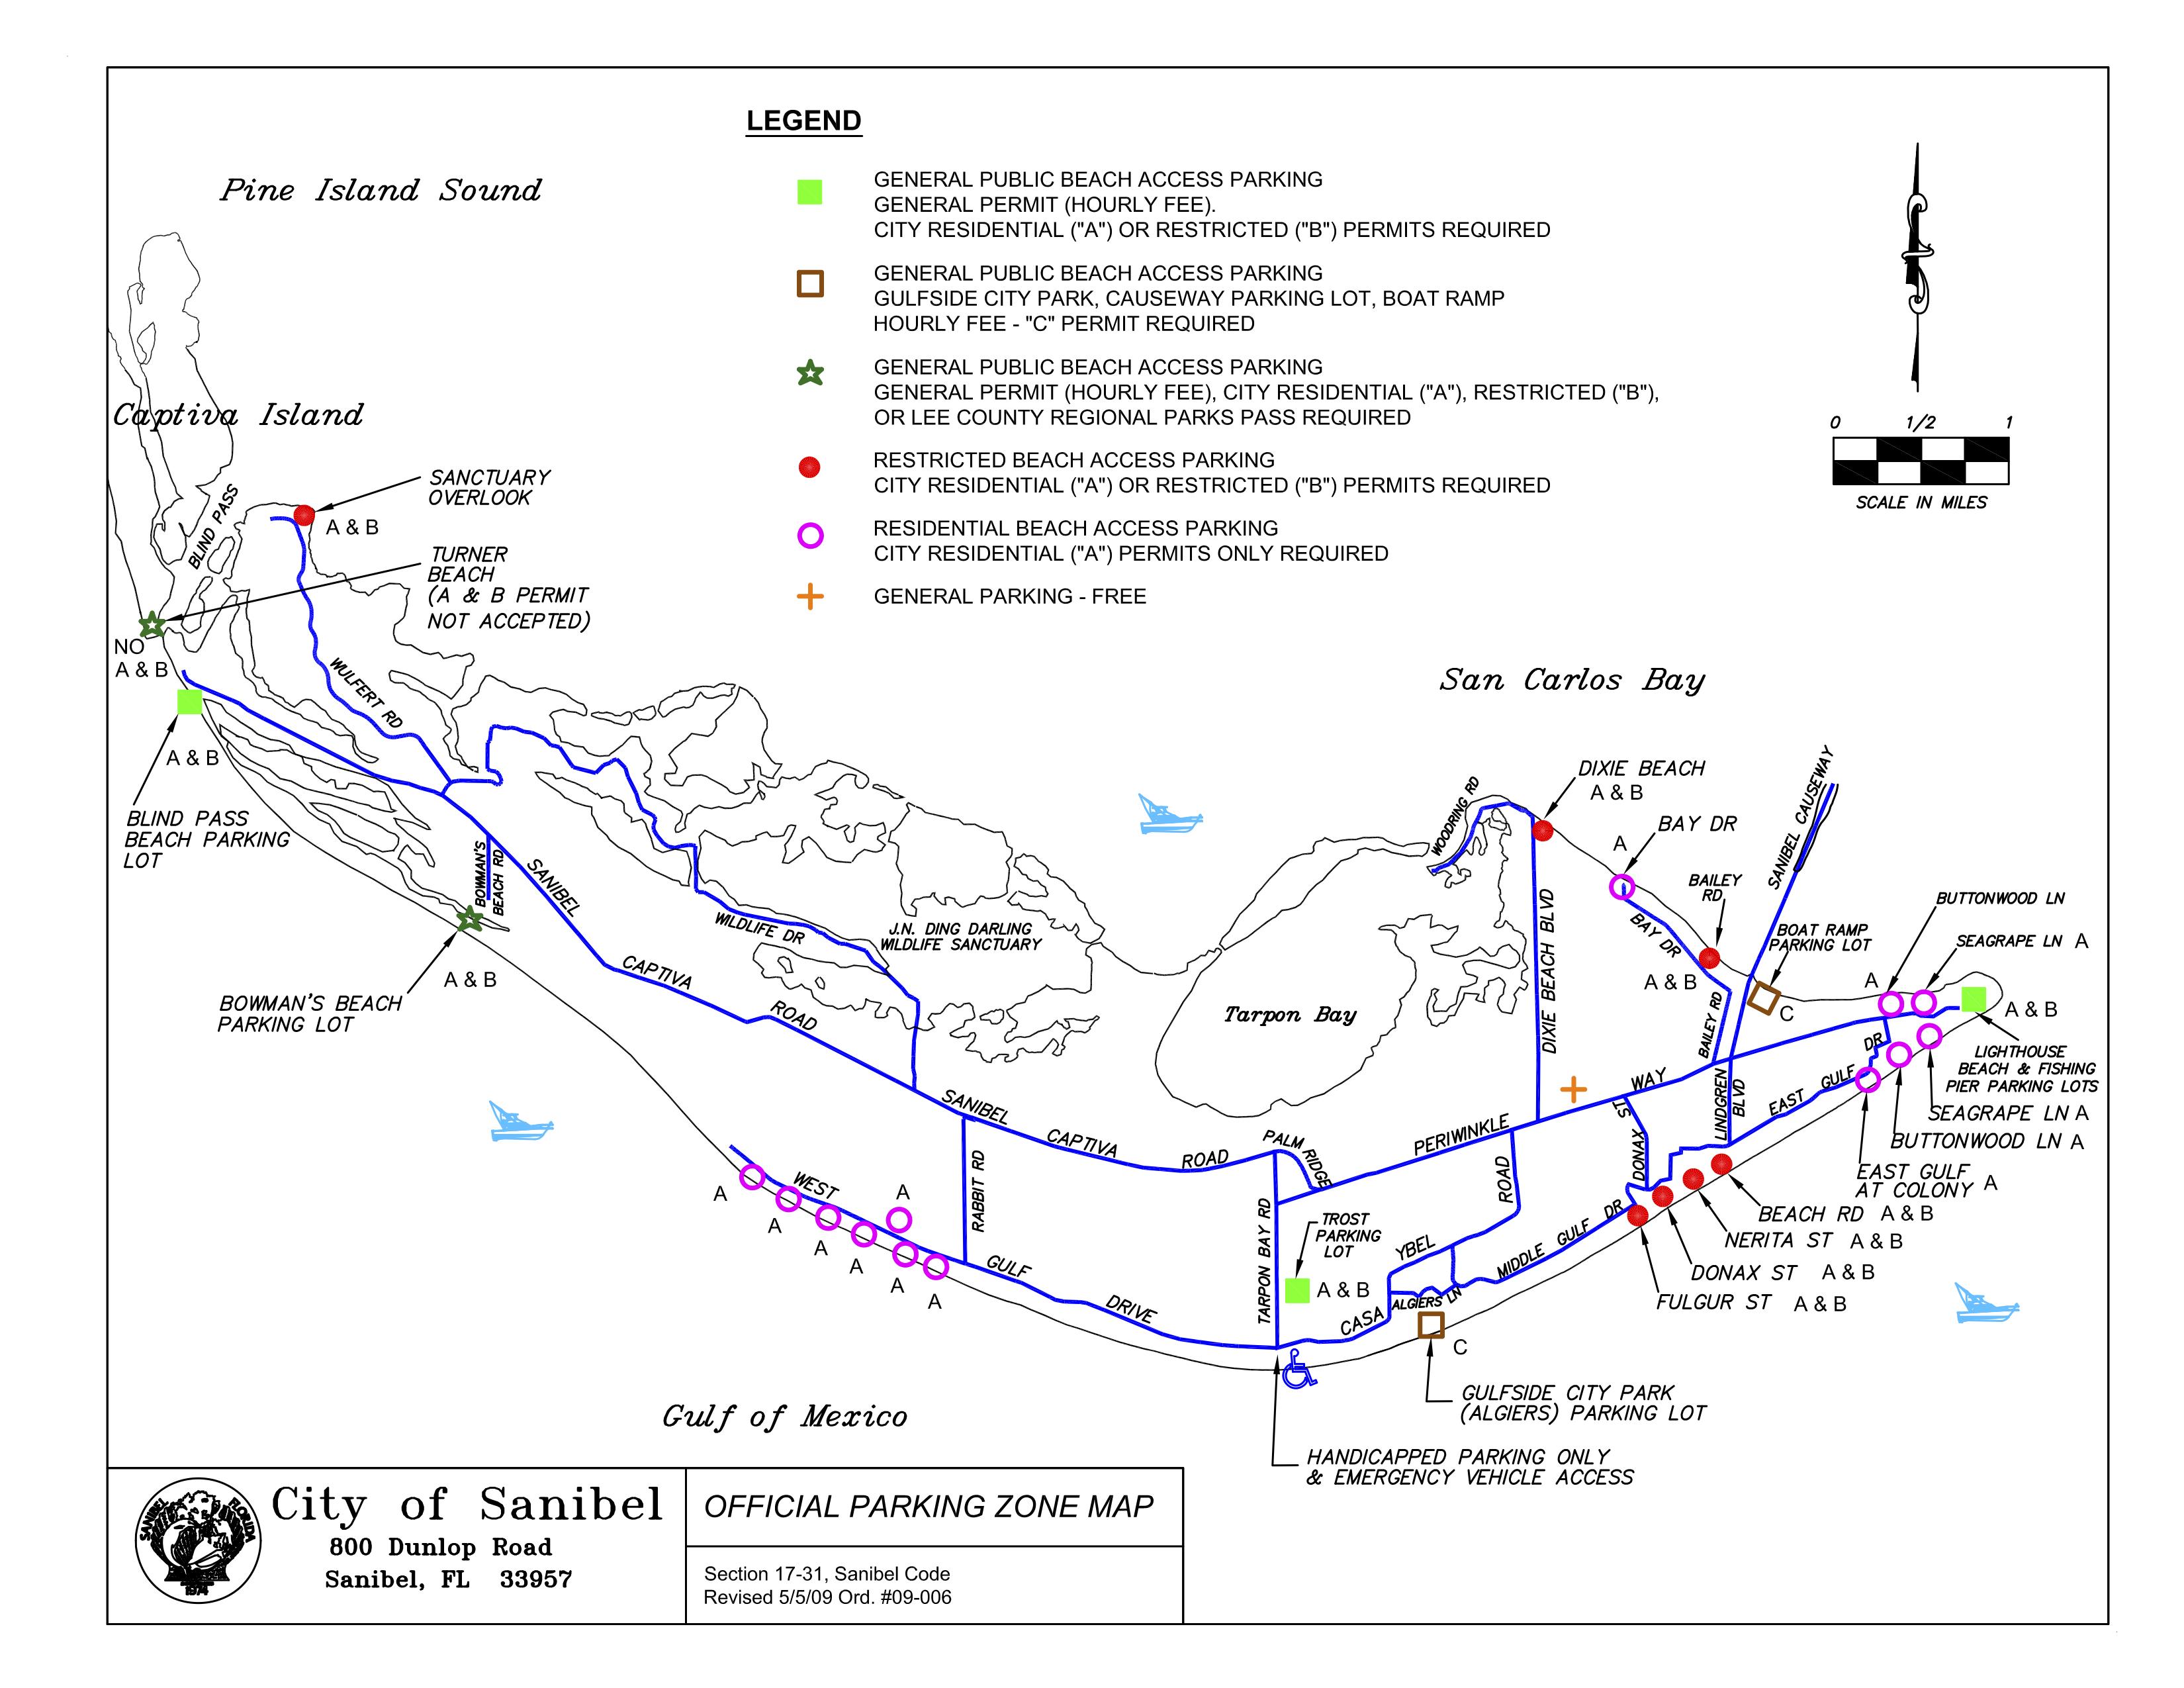 Map Parking On Sanibel | Travel | Pinterest | Sanibel Beach, Beach - Street Map Of Sanibel Island Florida